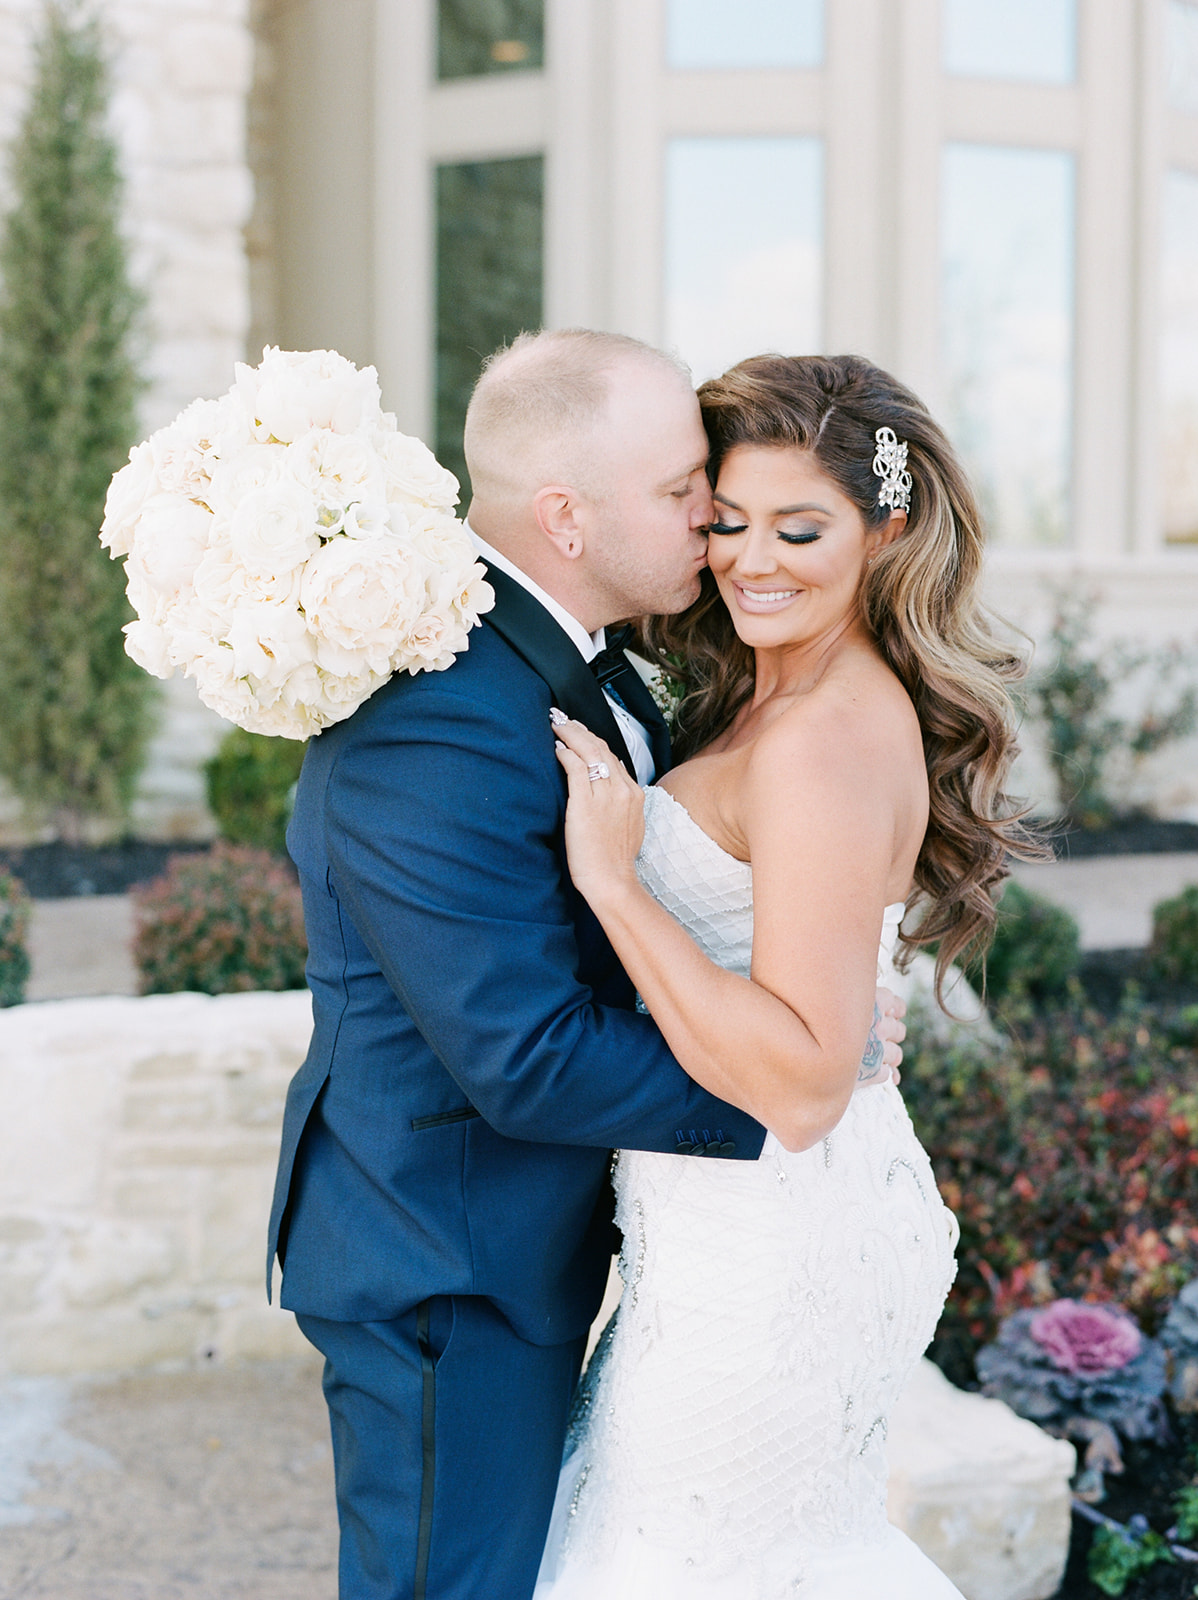 Sami Kathryn Wedding Photography featured on Alexa Kay Events